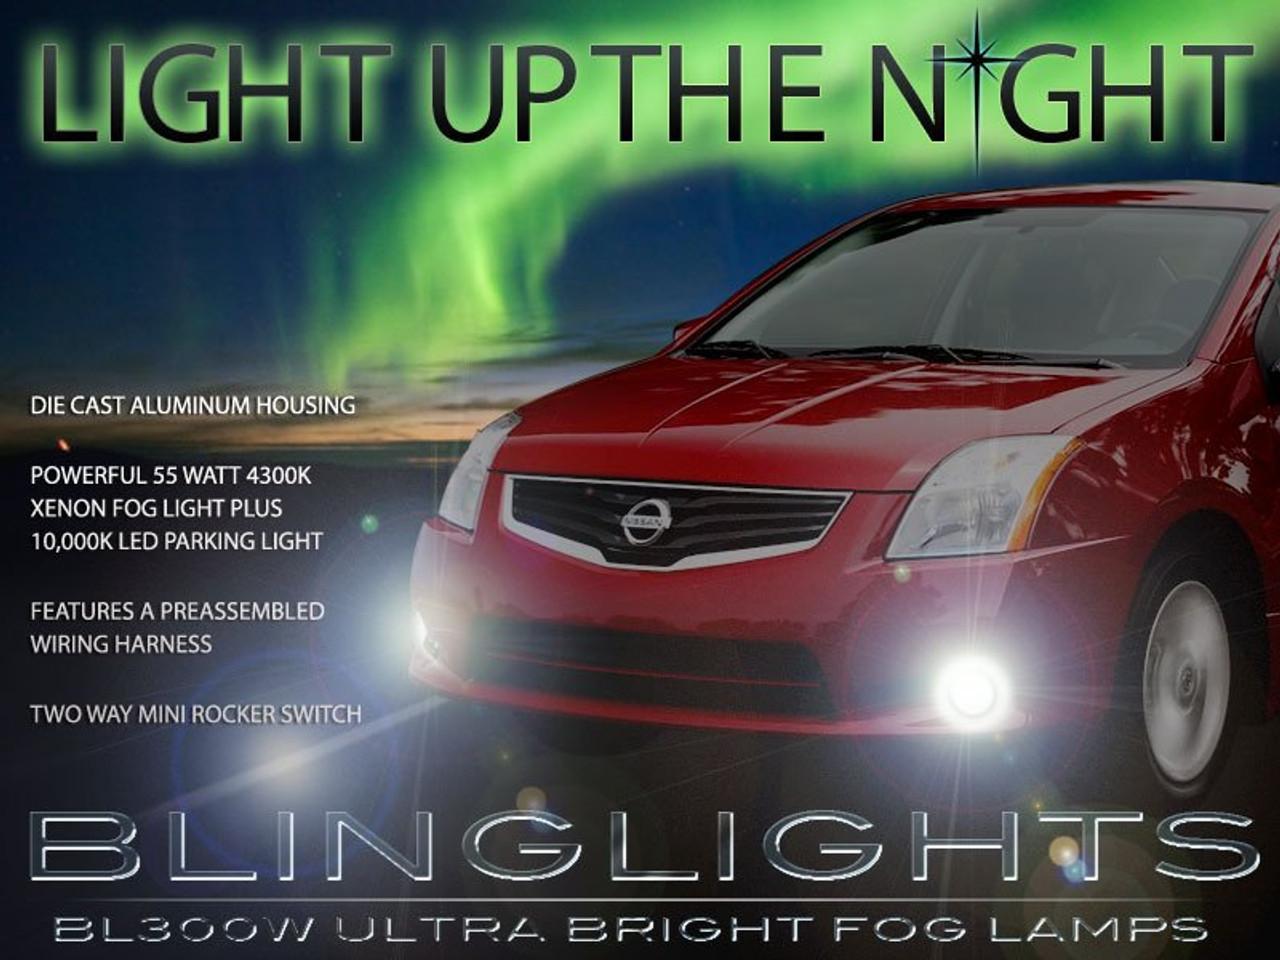 2007 2008 2009 2010 2011 2012 nissan sentra xenon led fog lamps driving lights foglamps kit blinglights com [ 1280 x 960 Pixel ]